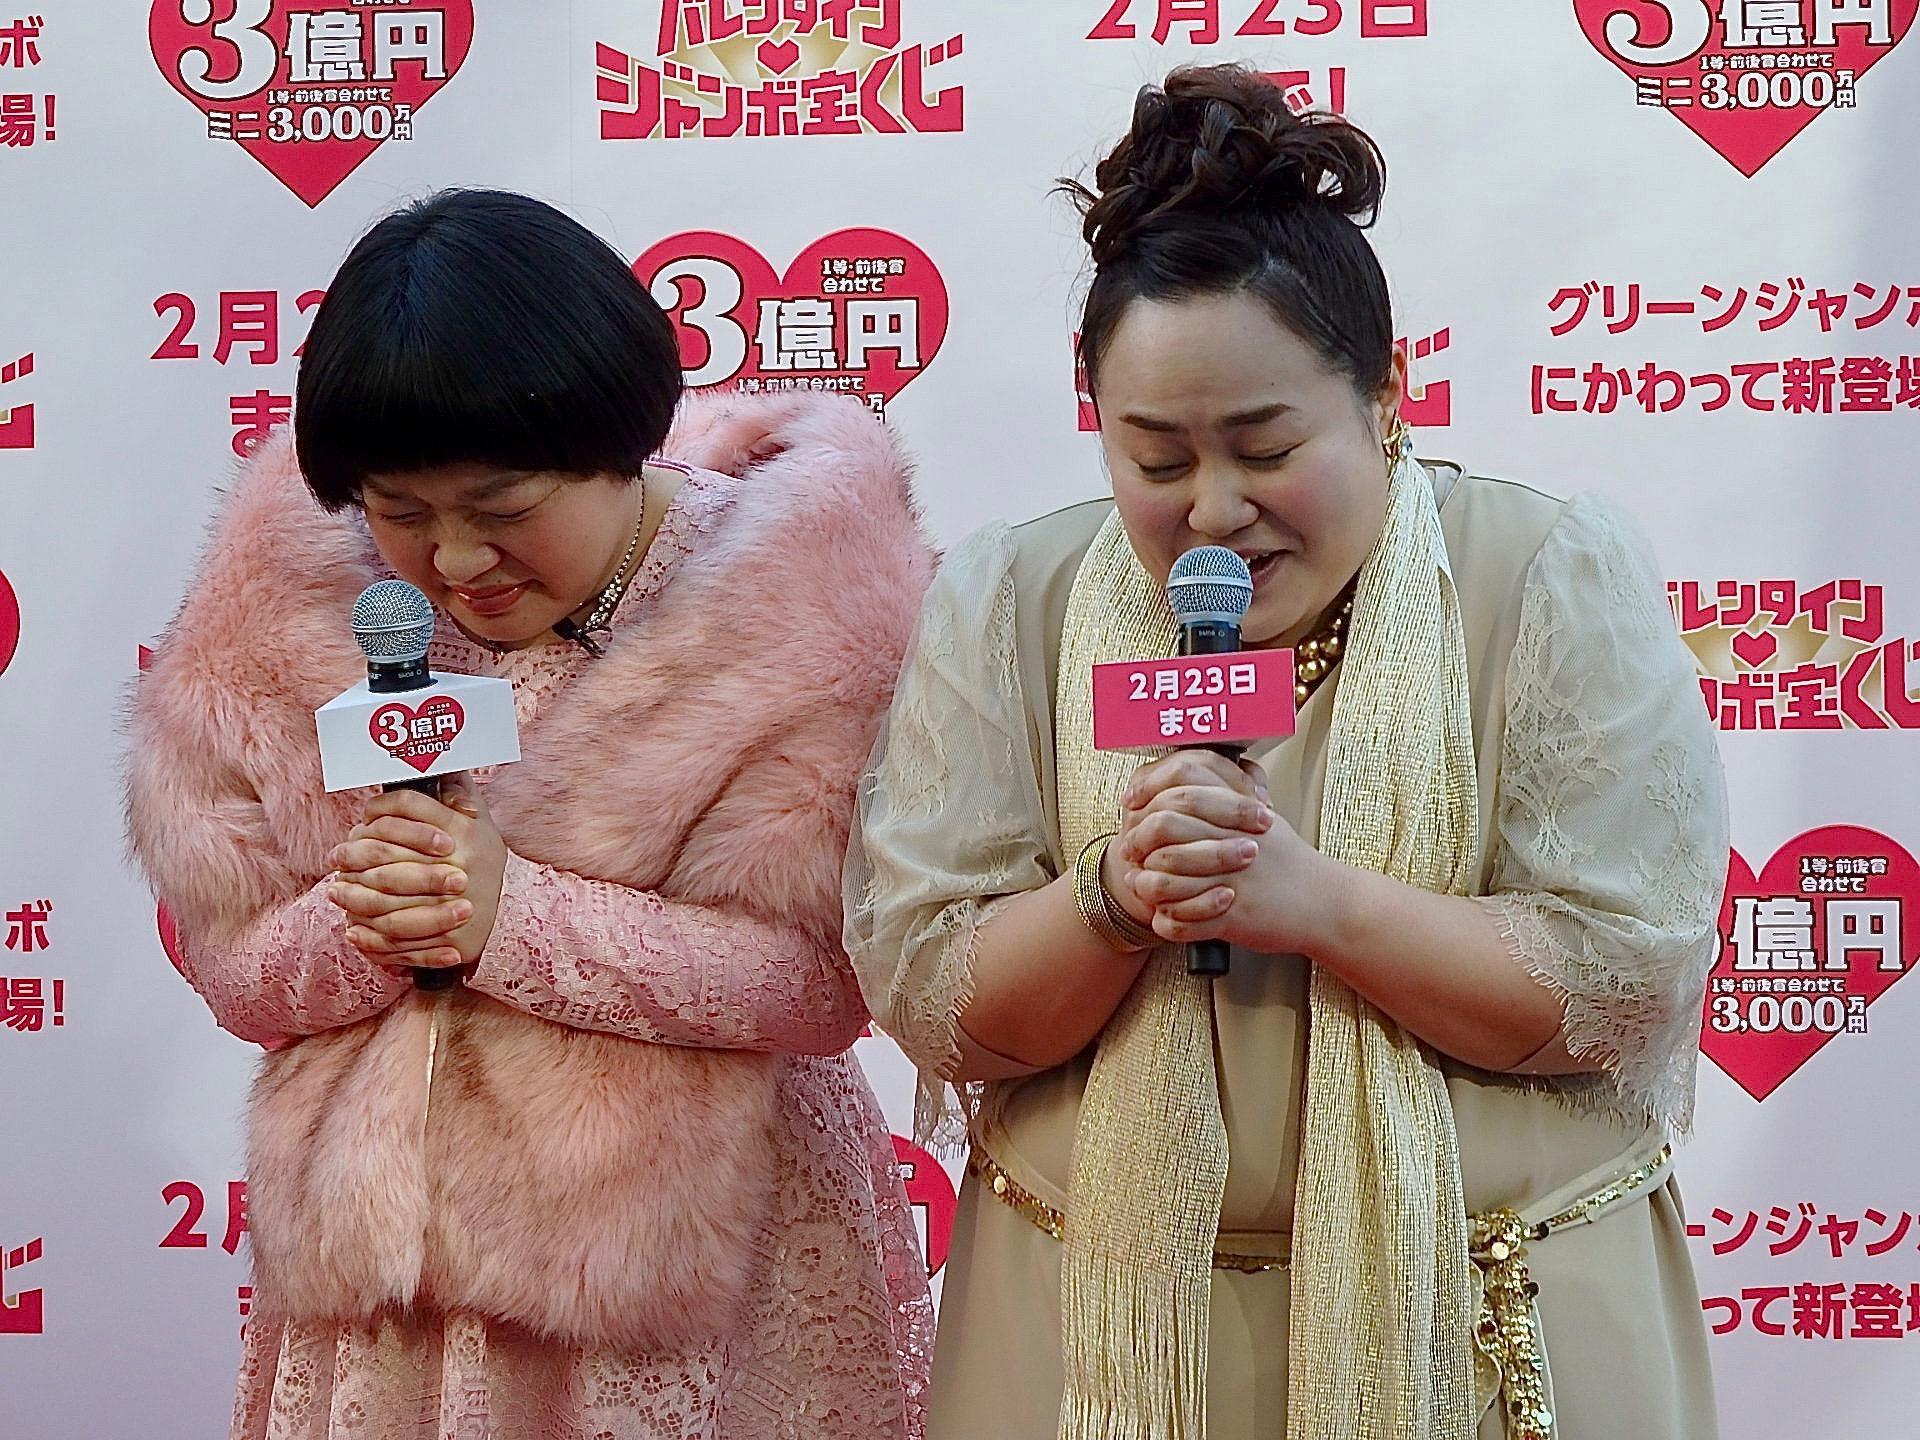 http://news.yoshimoto.co.jp/20180131180119-8cef8d1ce80e02ea05aa7b8b5719f4b3c0670adc.jpg